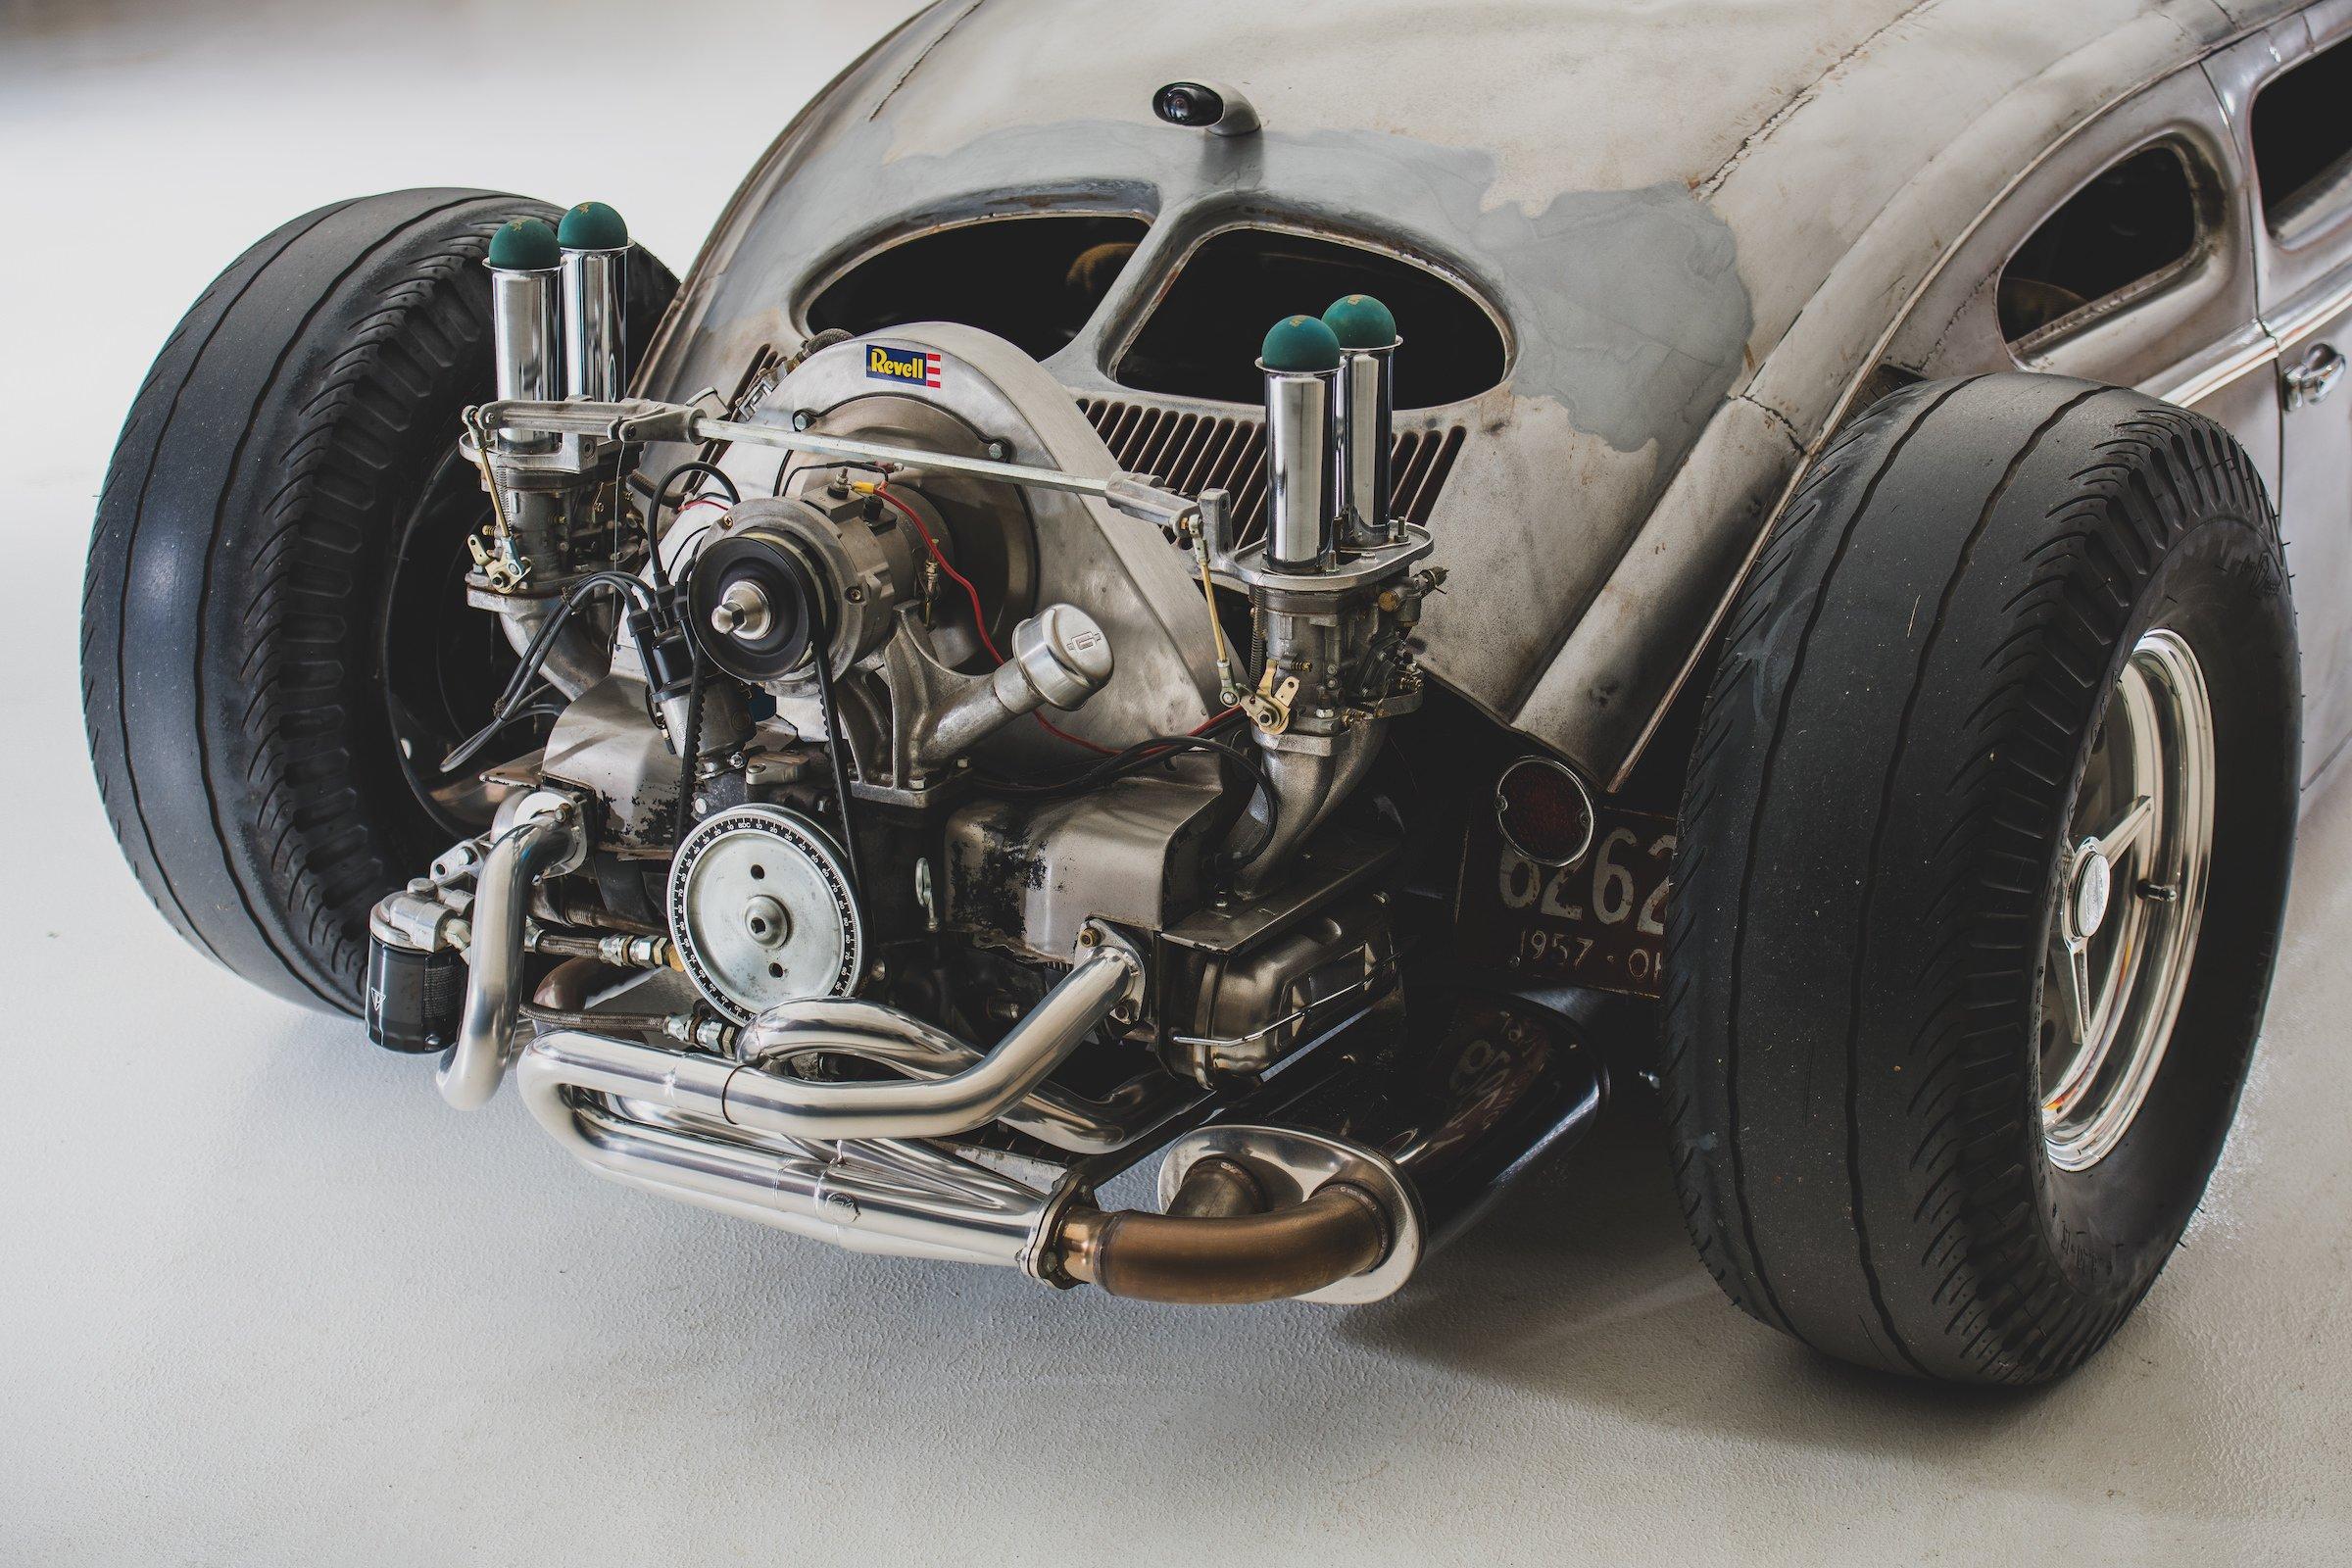 Volkswagen Beetle Outlaw Engine